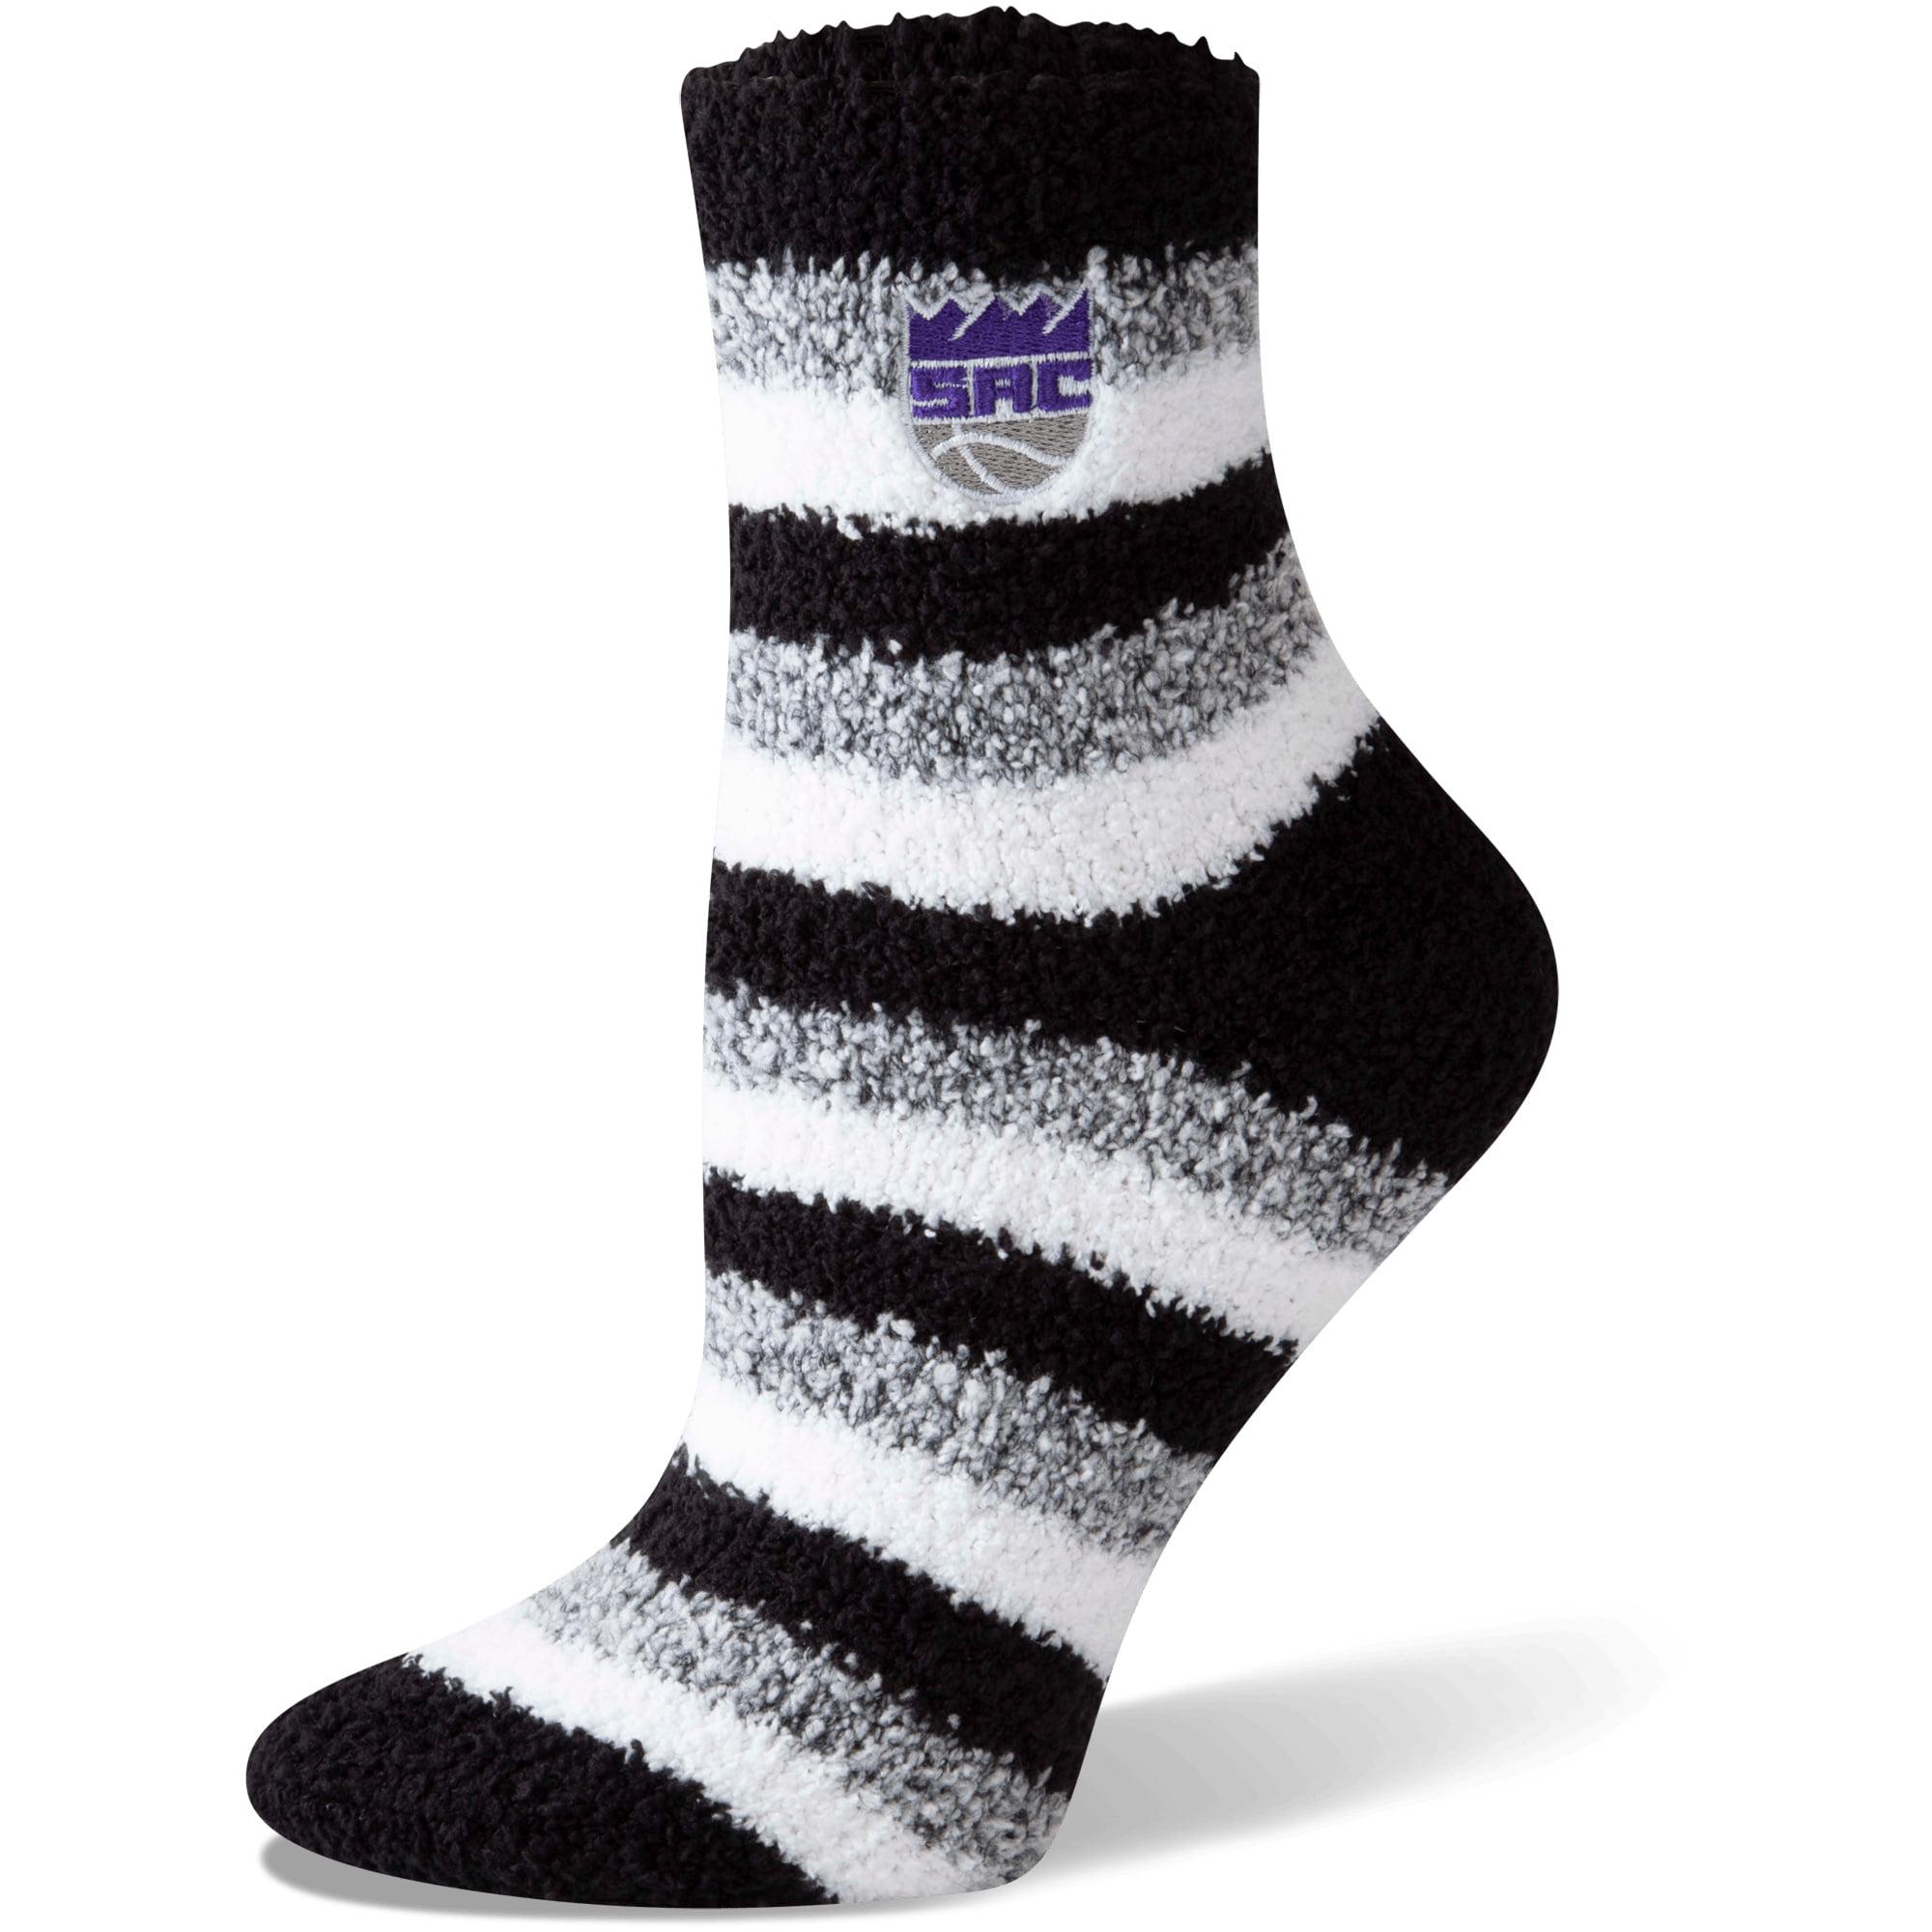 Sacramento Kings Women's Fuzzy Steps Quarter-Length Socks - M